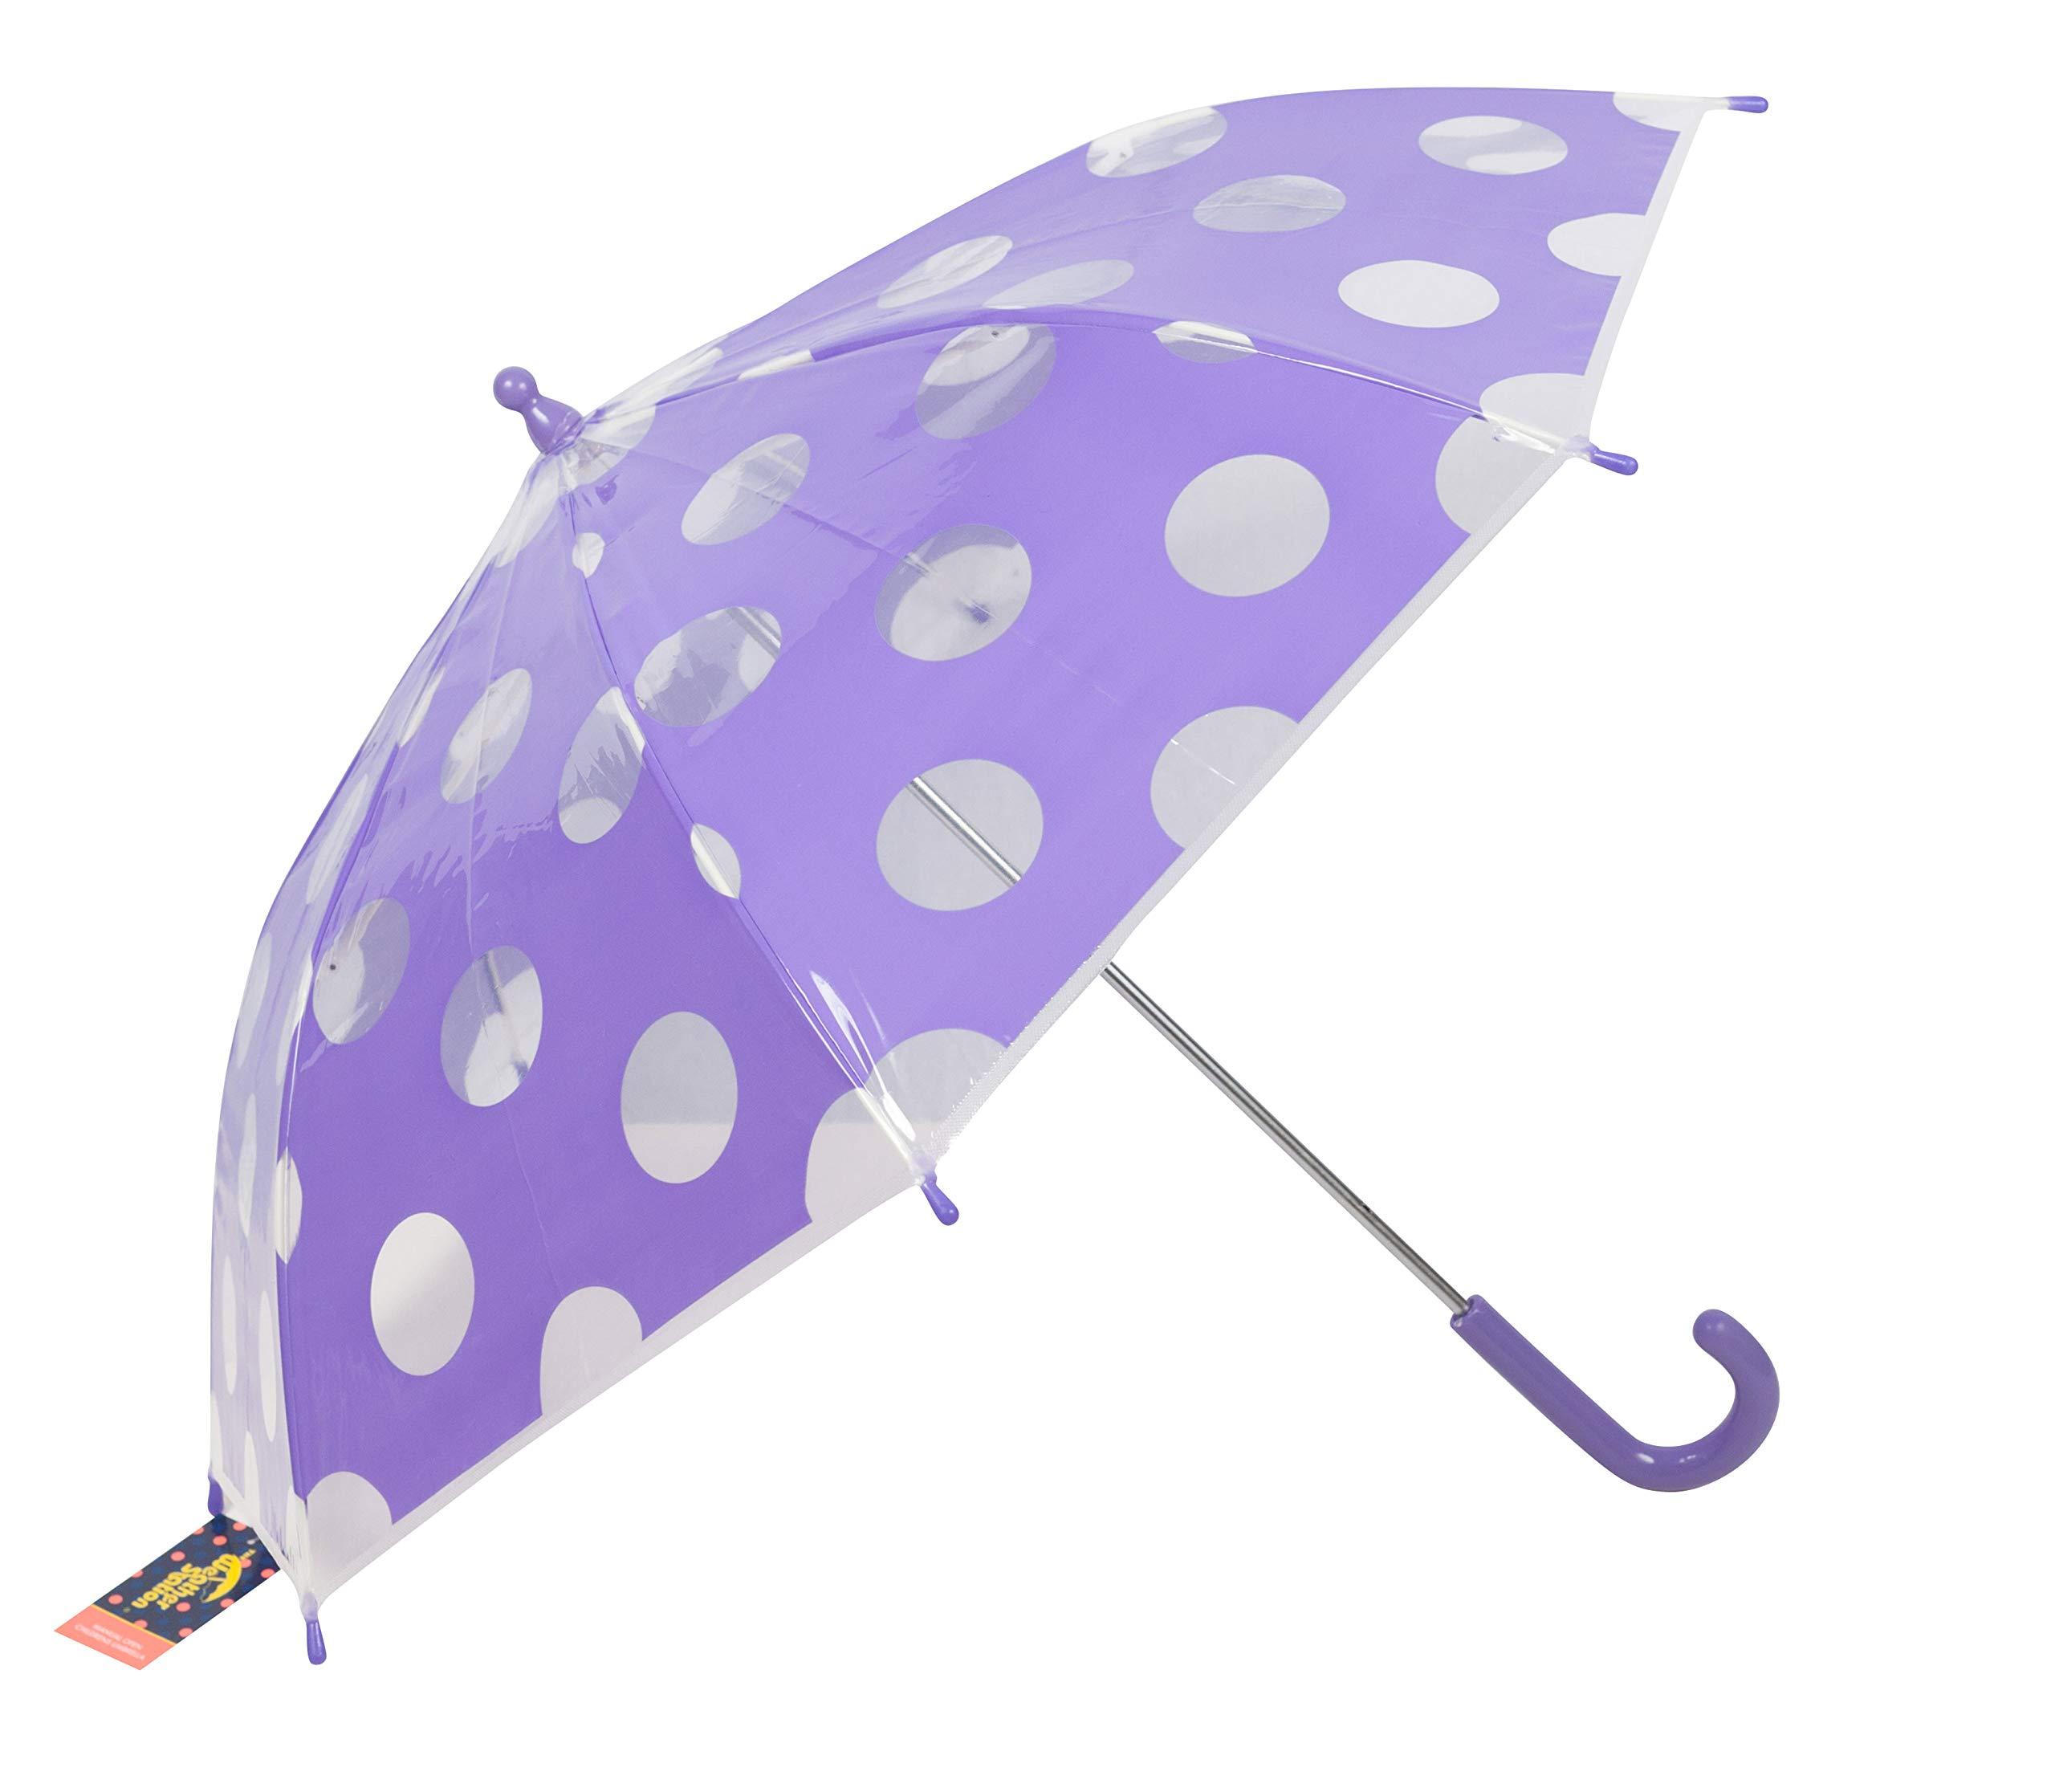 Girls Umbrella, 100% Polyester, 26-inch Coverage, Styles Vary, 1-umbrella